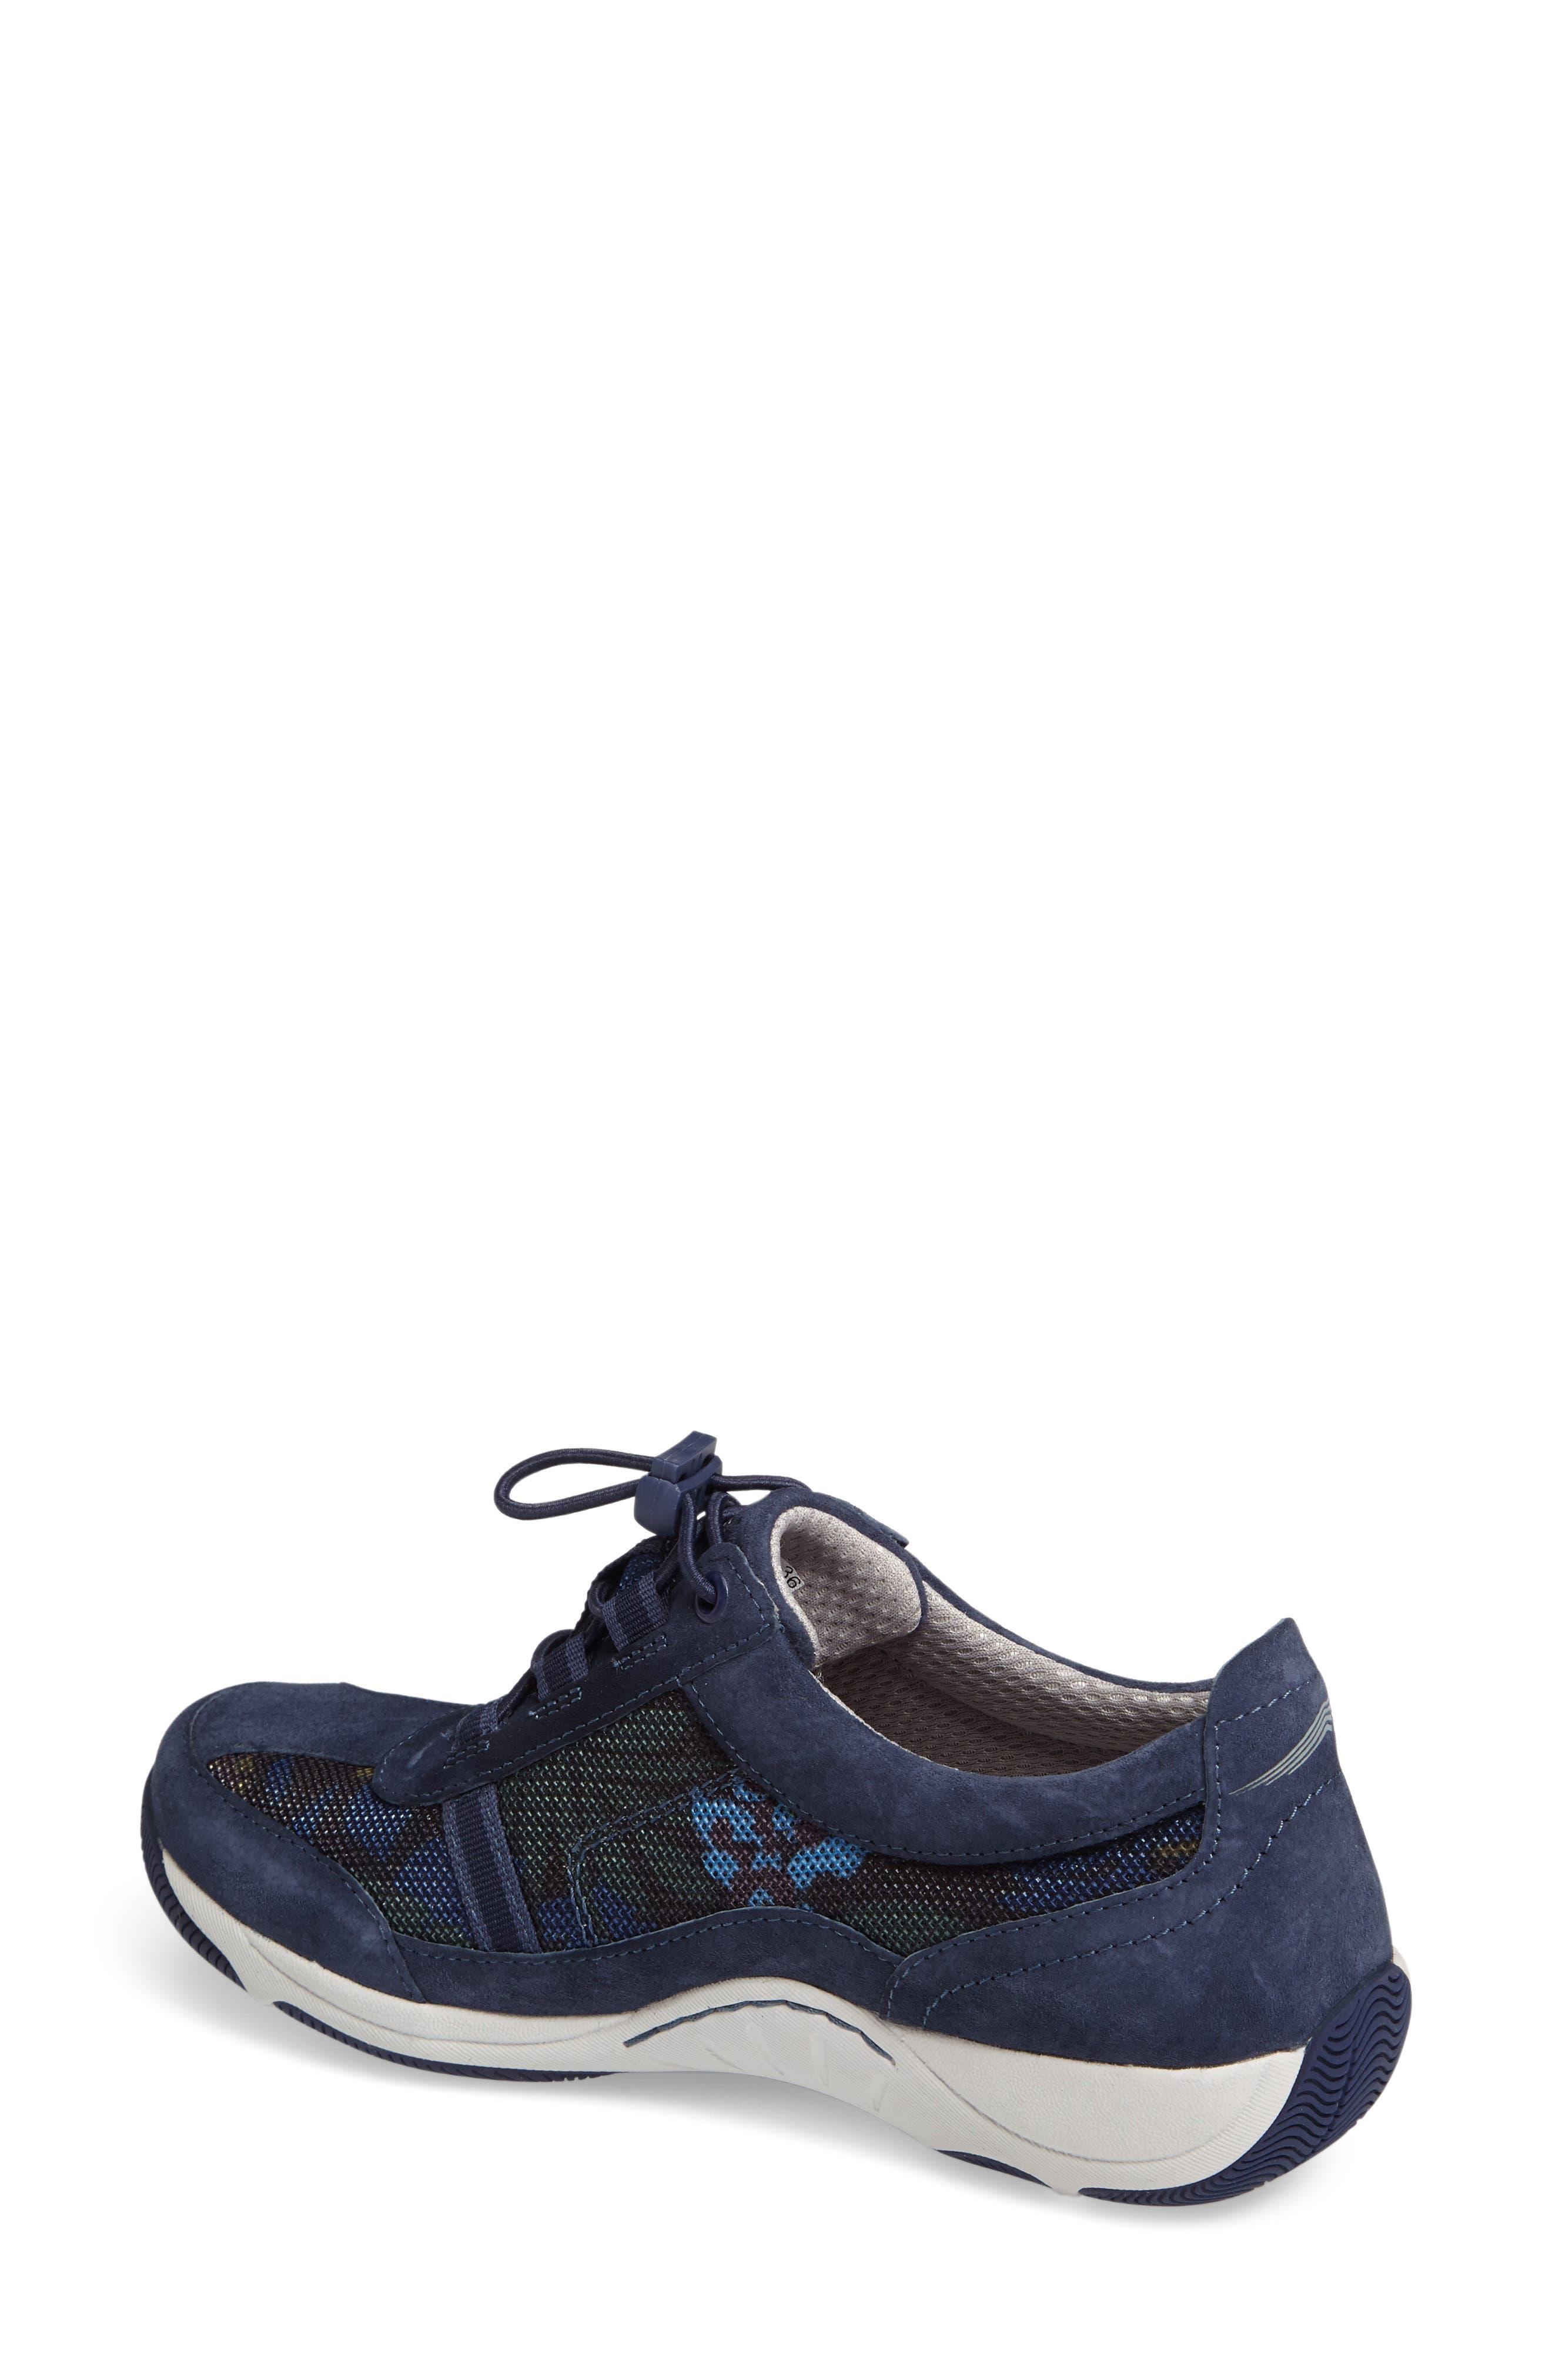 'Helen' Suede & Mesh Sneaker,                             Alternate thumbnail 28, color,